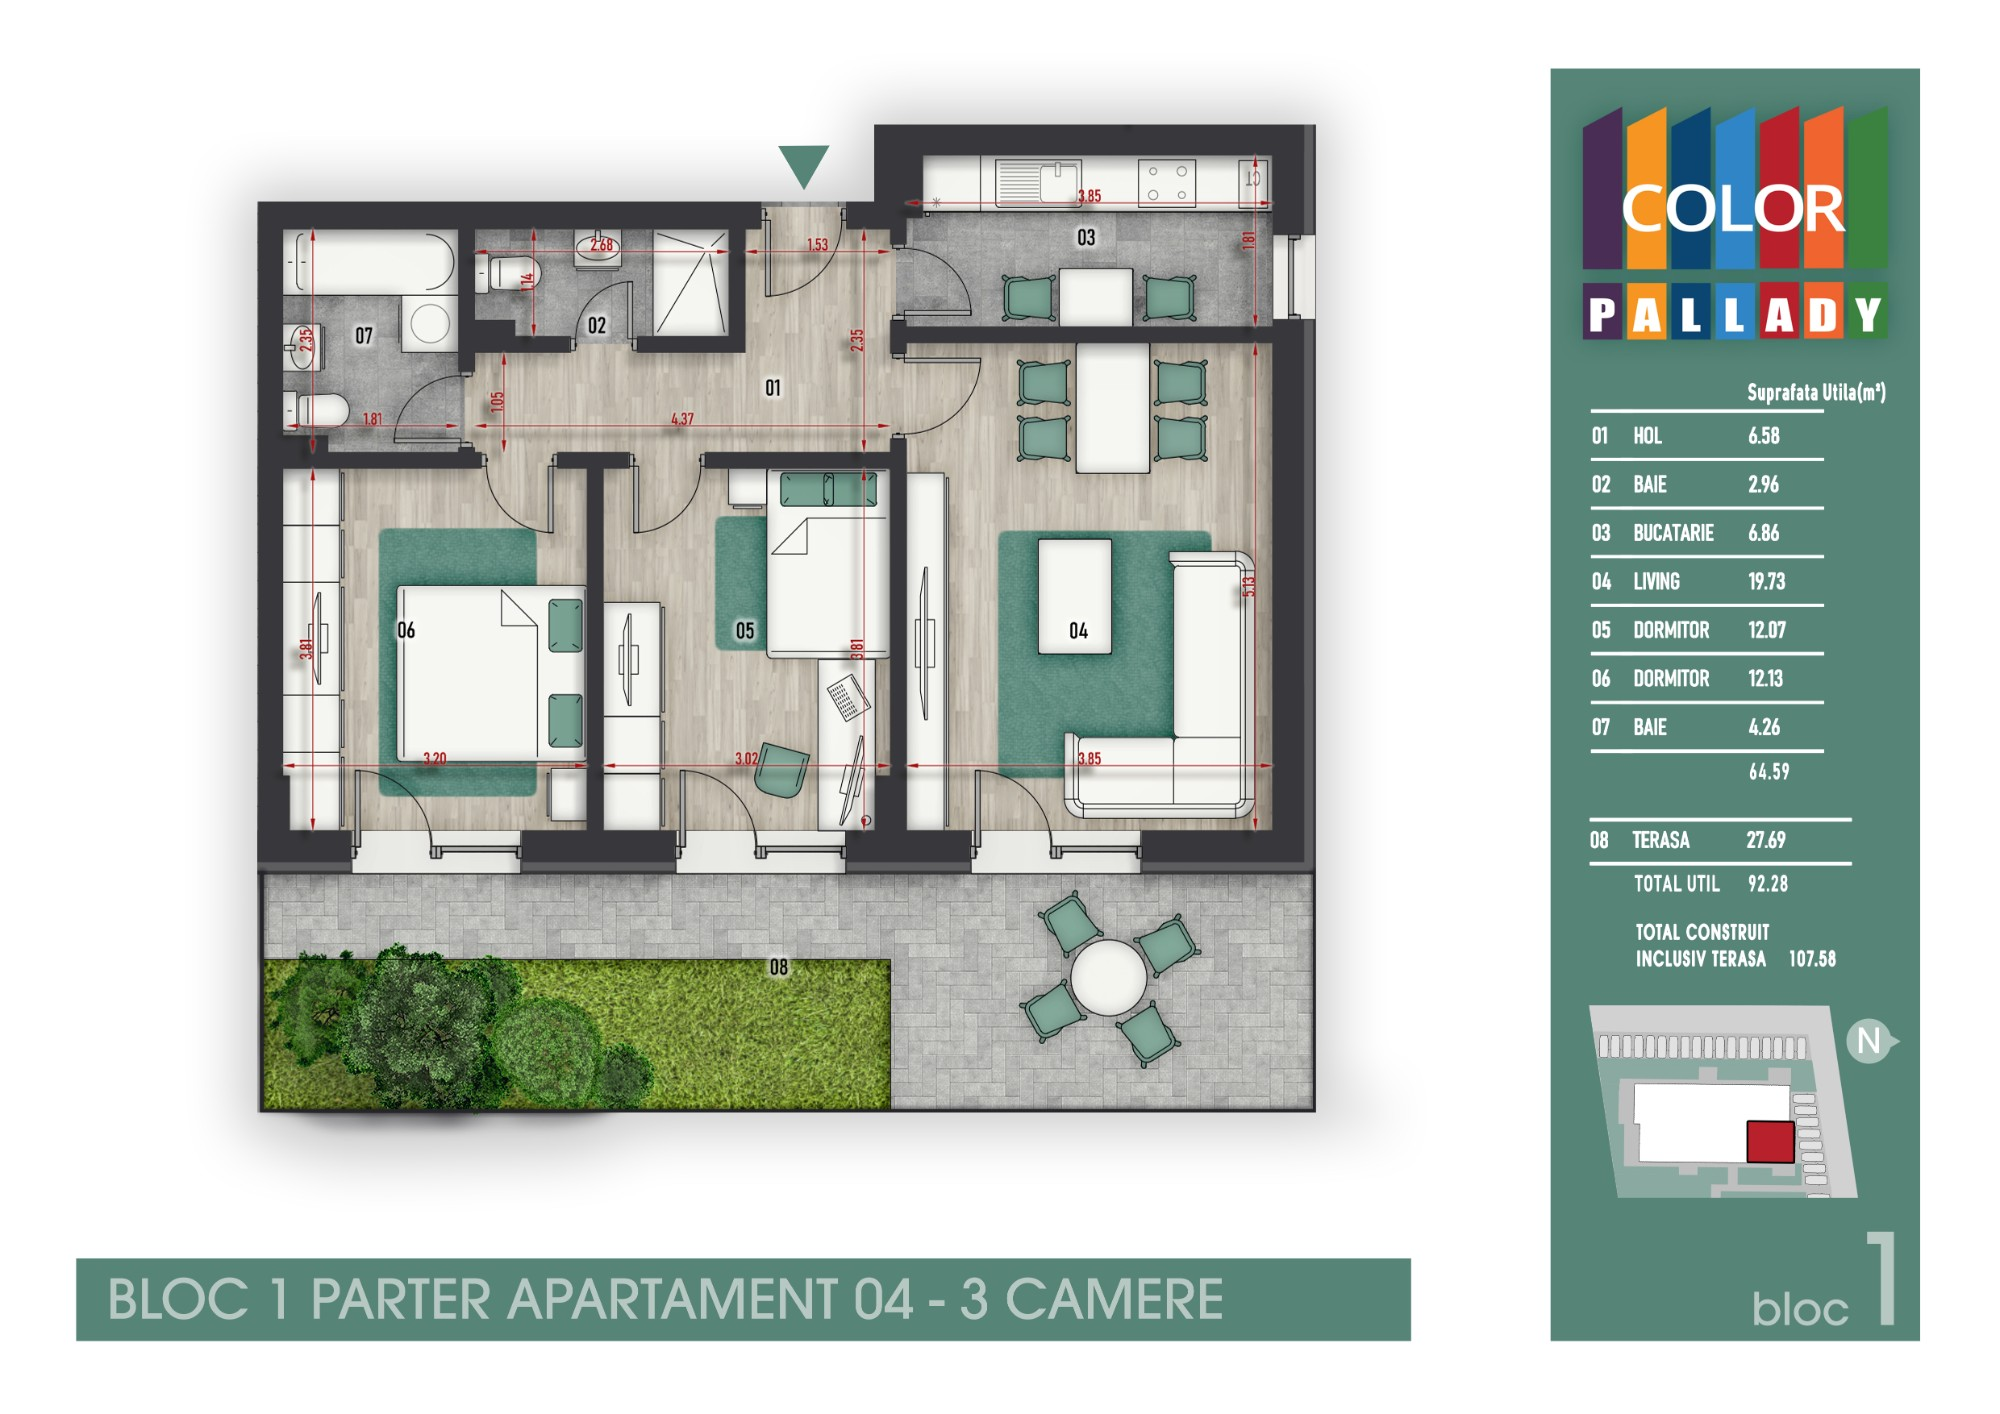 Bloc 1 - Parter - Apartament 04